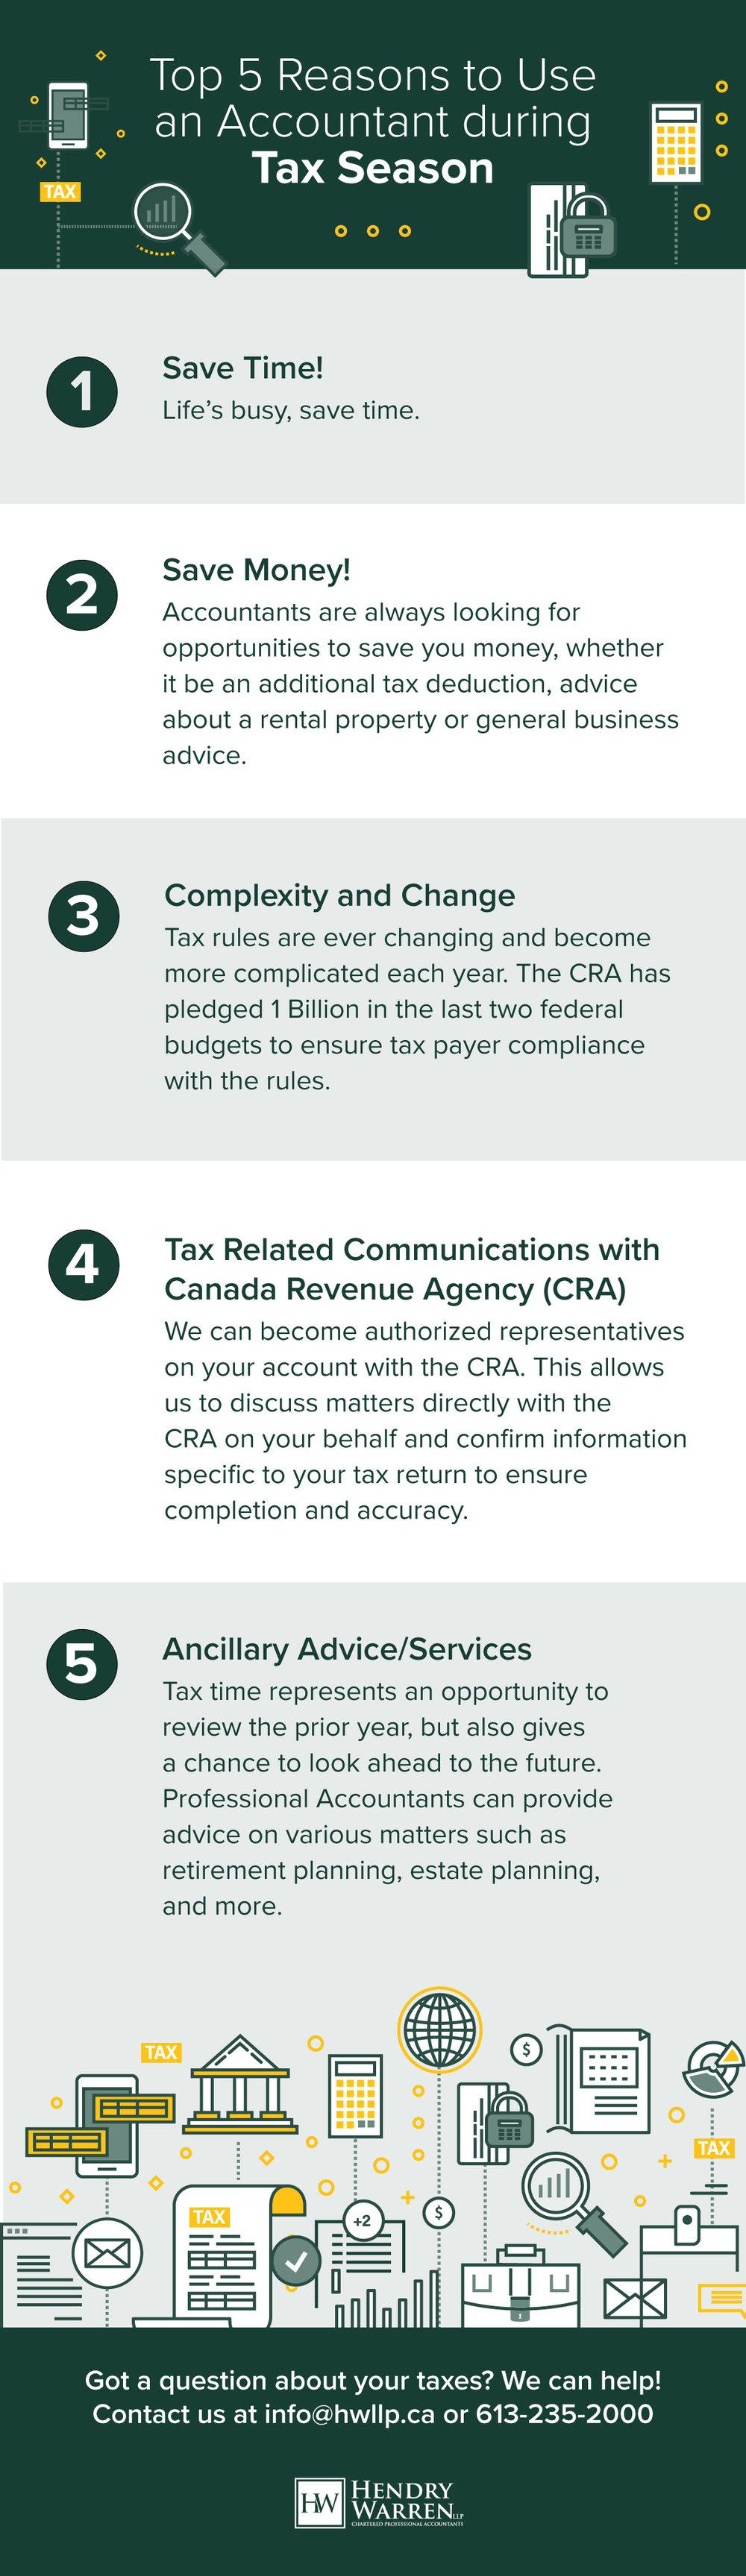 HW_TaxTips_Infographic.jpg